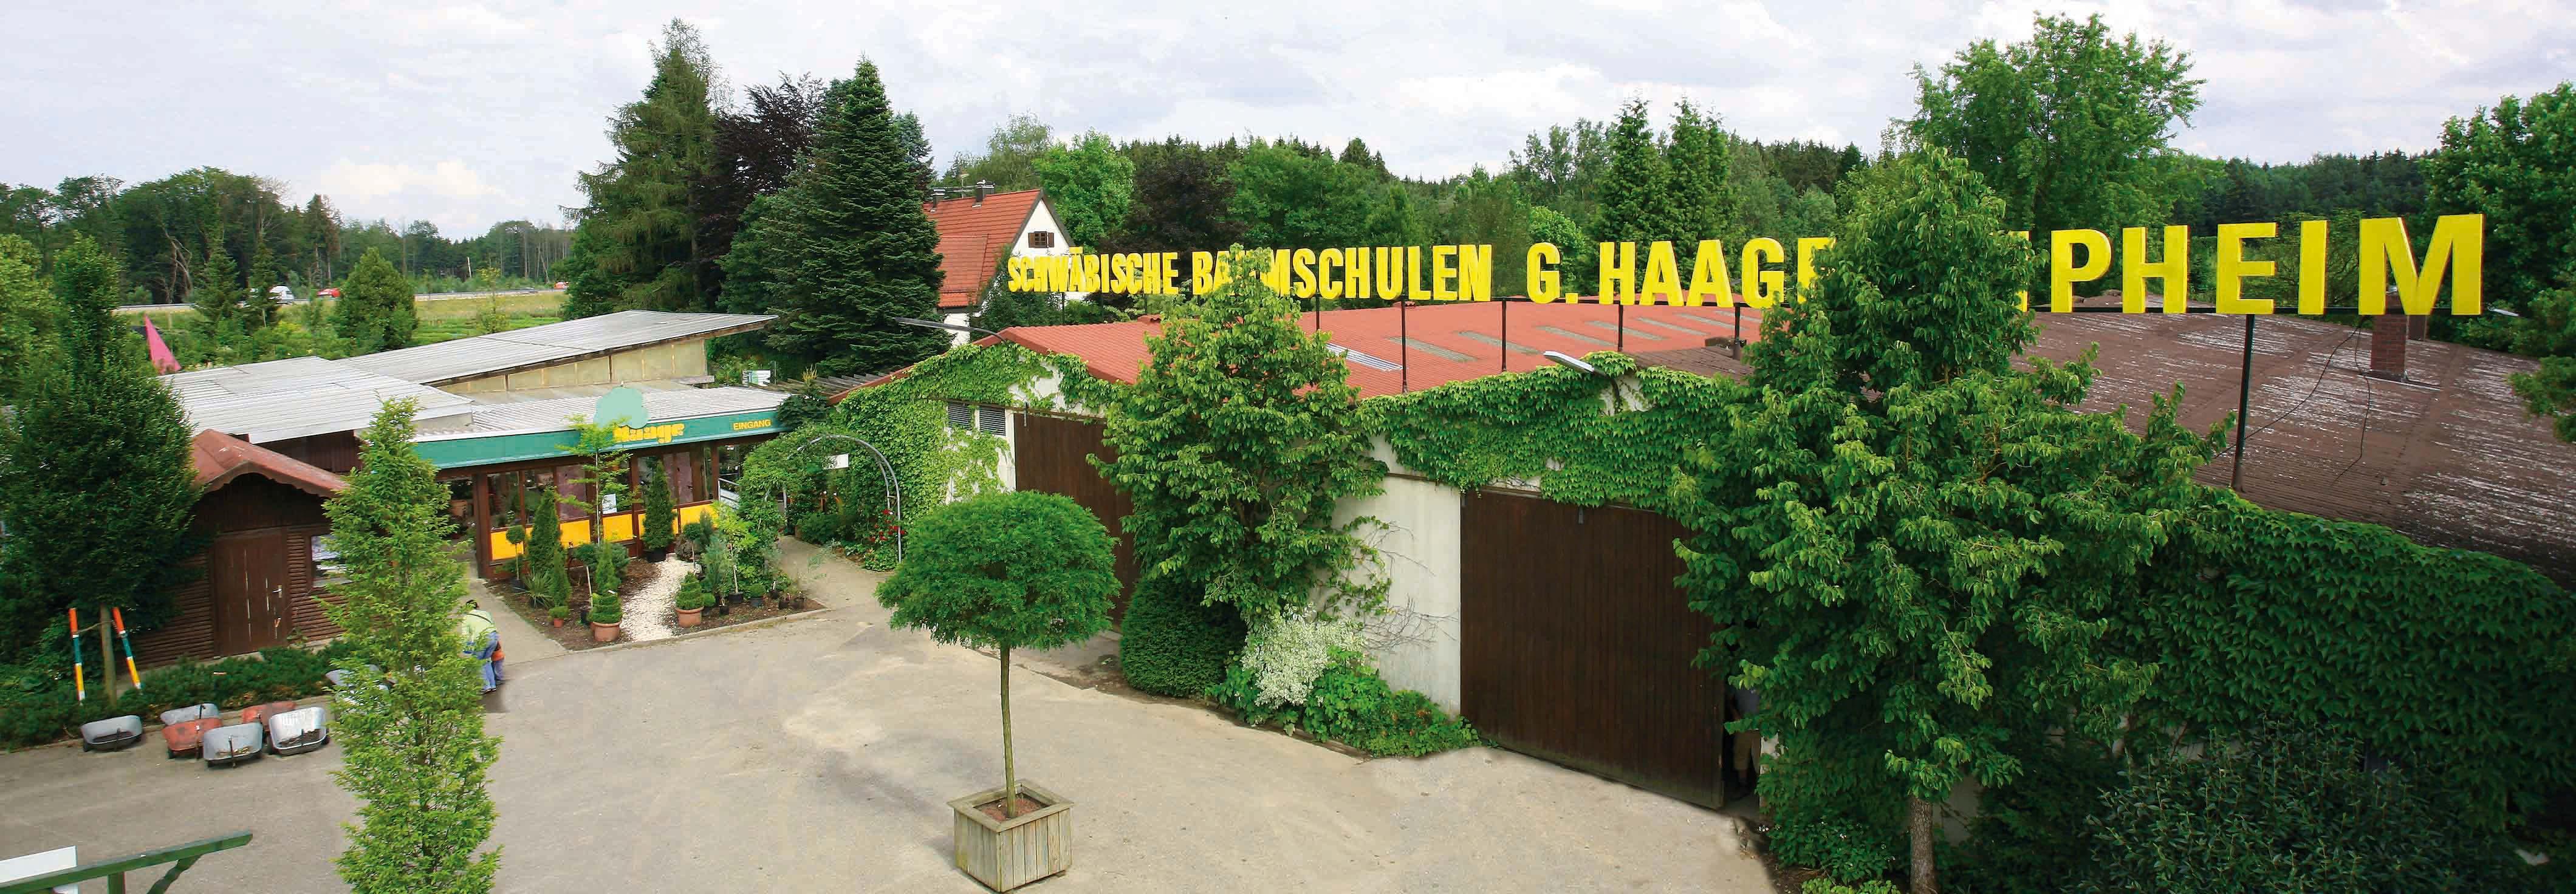 Baumschulen Haage Leipheim